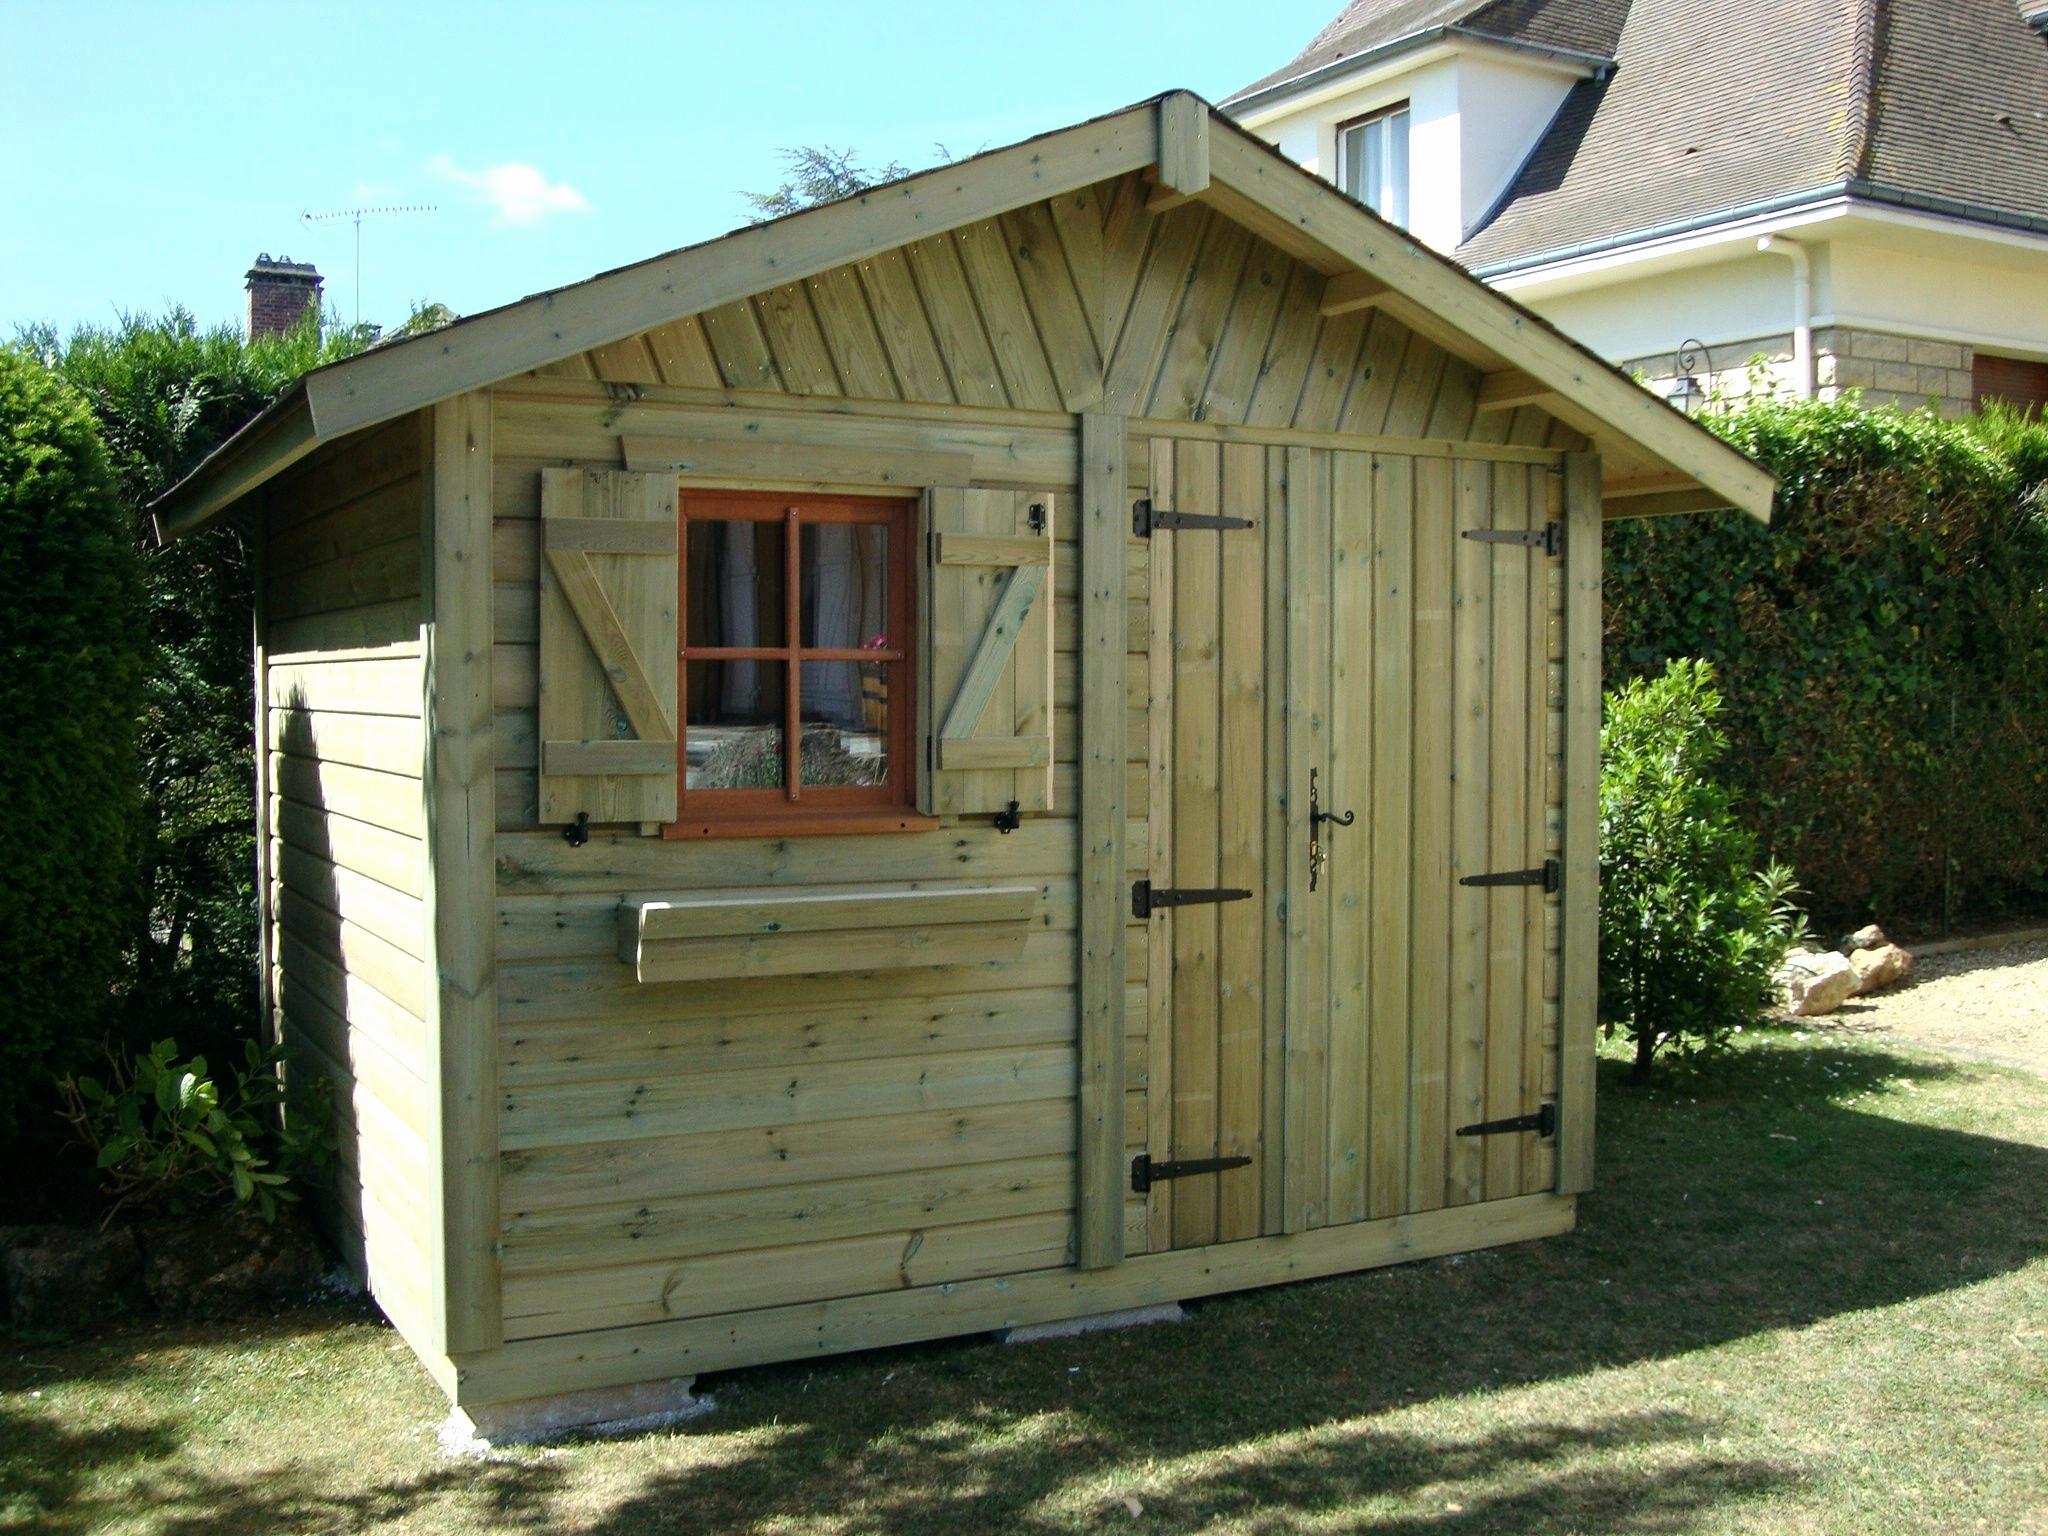 Abris Spa Pas Cher Impressionnant Galerie Abri Jardin tole Impressionnant Abri De Spa Pas Cher Brico Depot